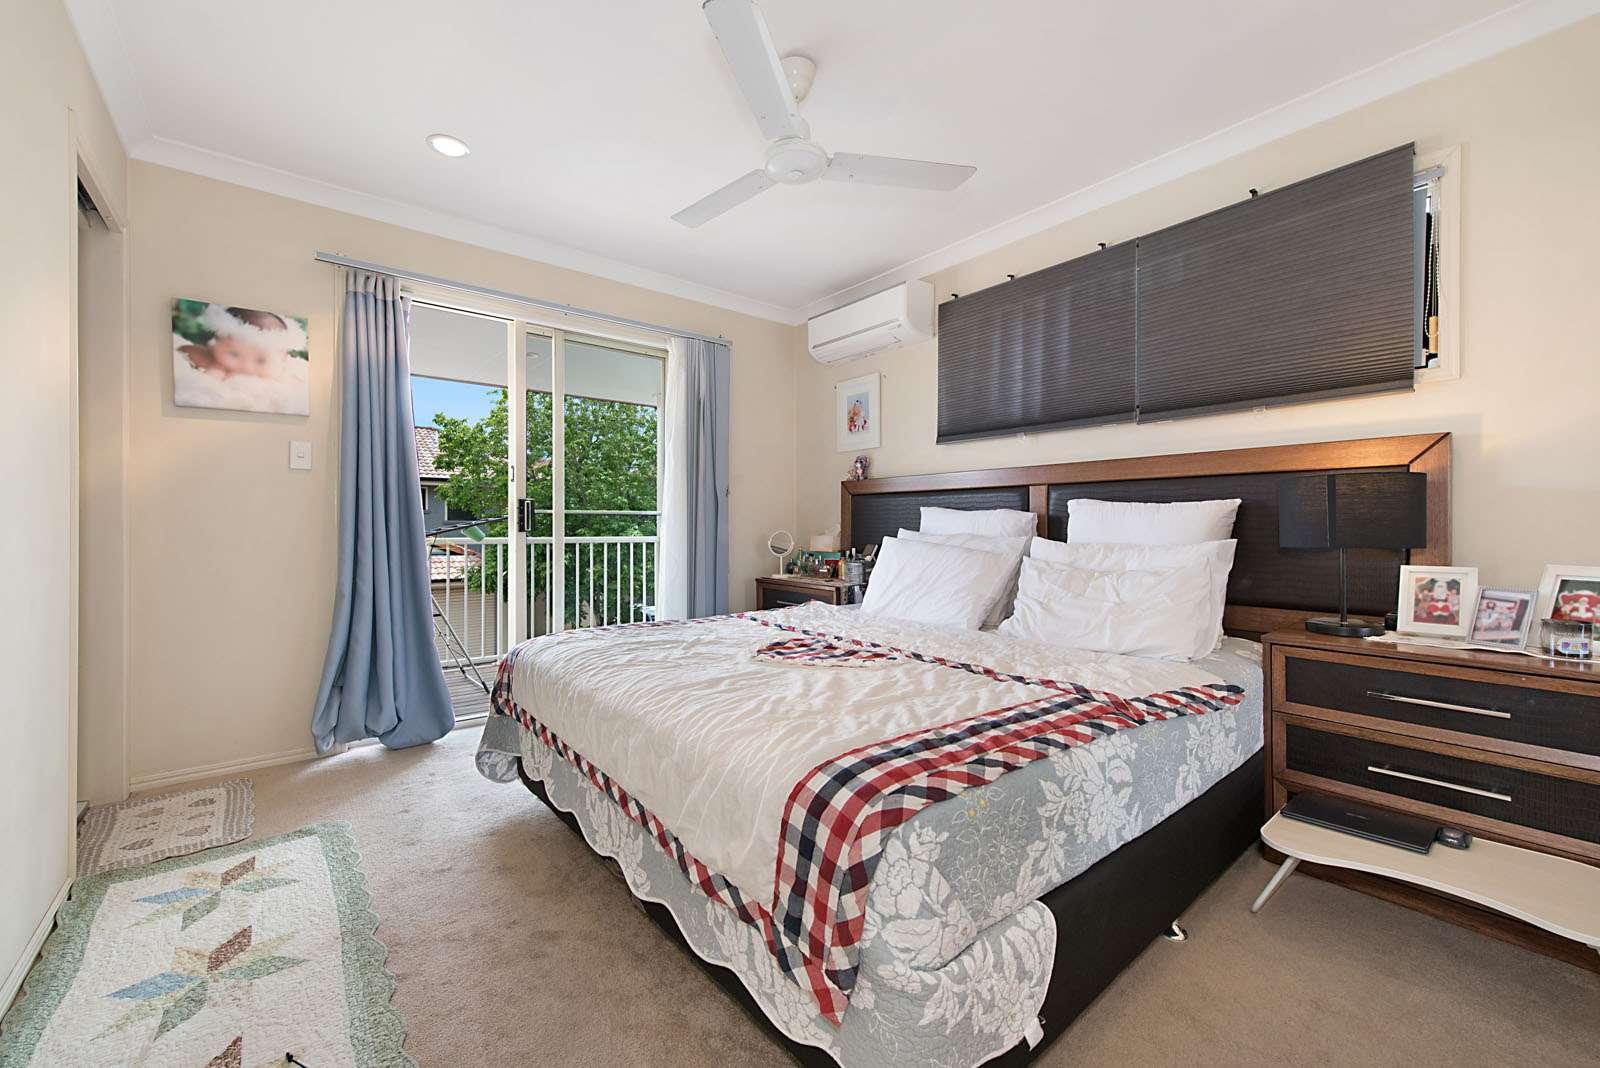 41/25 Buckingham Place, Eight Mile Plains, QLD 4113